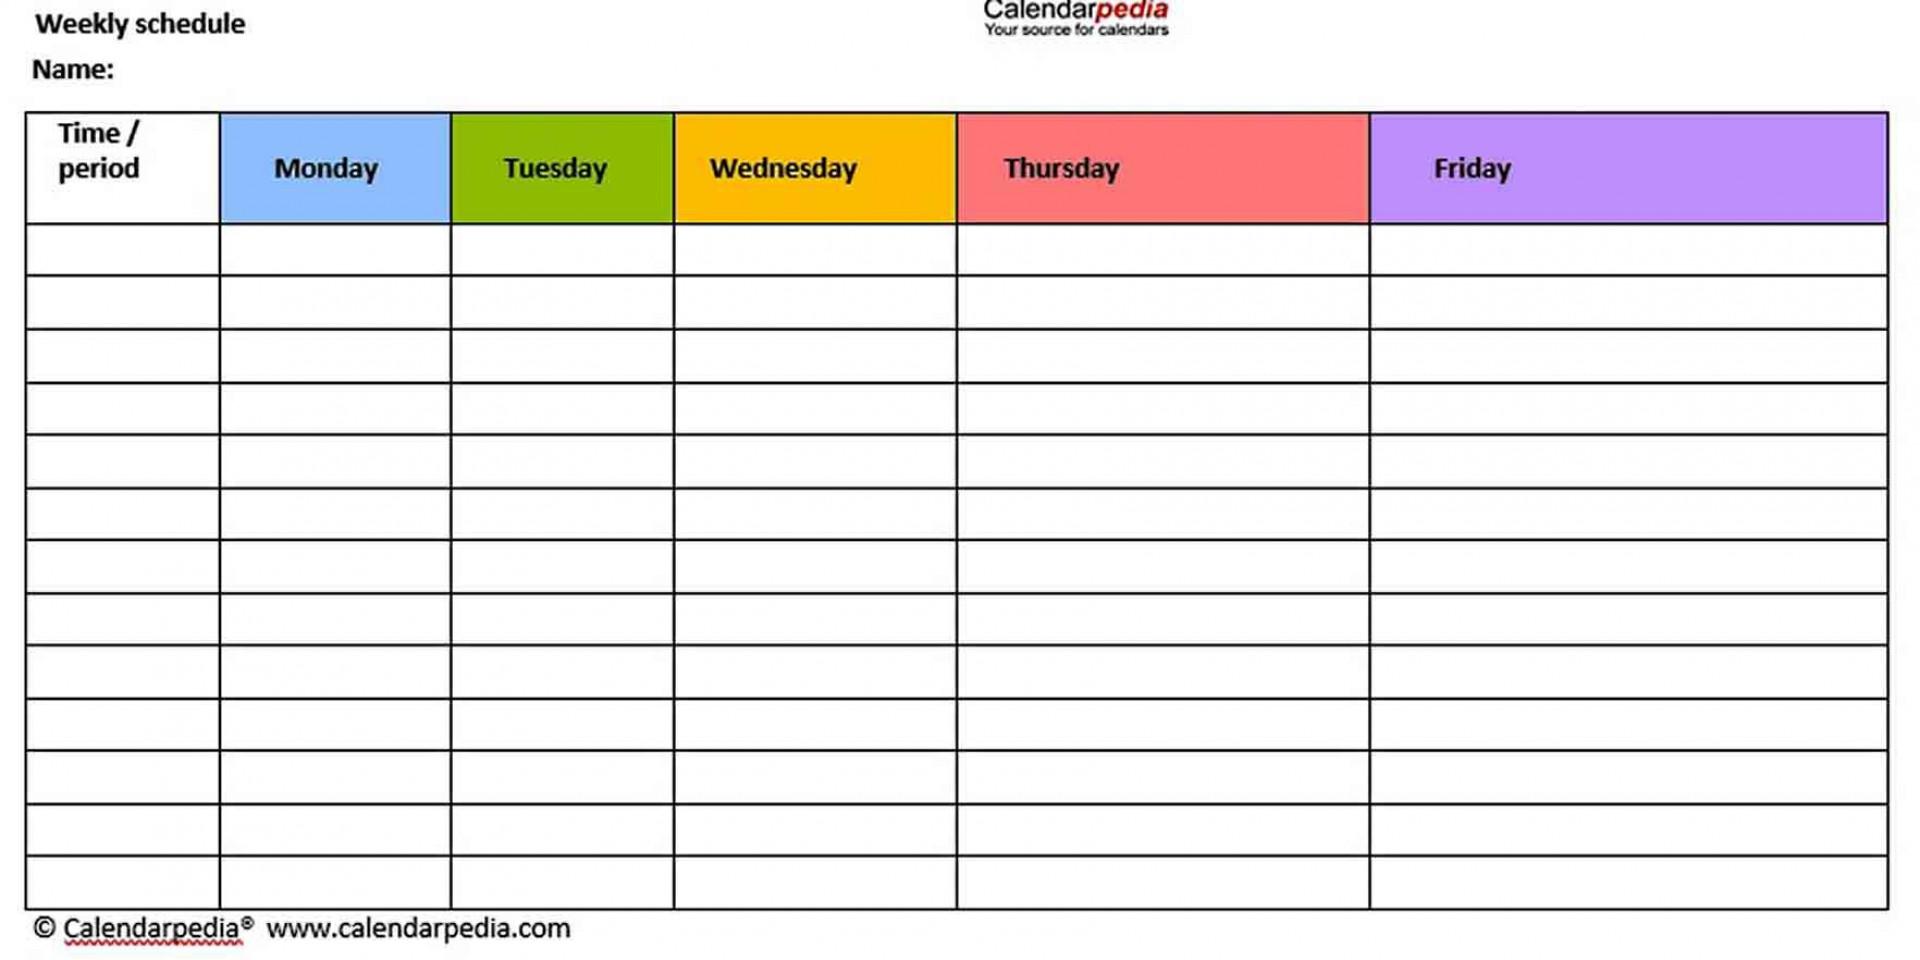 003 Fantastic Weekly Workout Schedule Template Inspiration  12 Week Plan Training Calendar1920